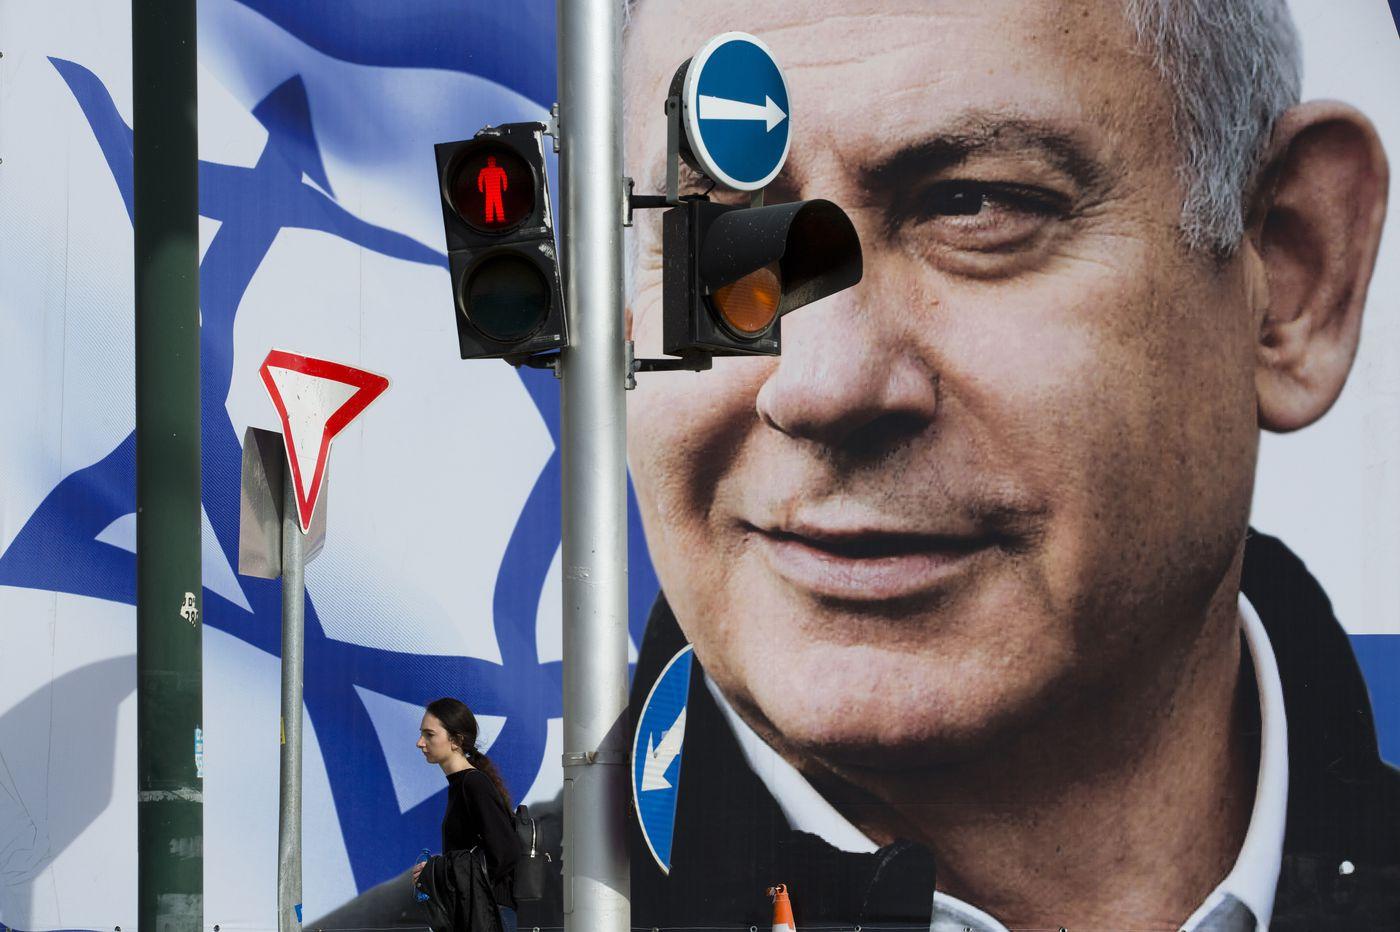 Israeli group says network of bots is stumping for Netanyahu